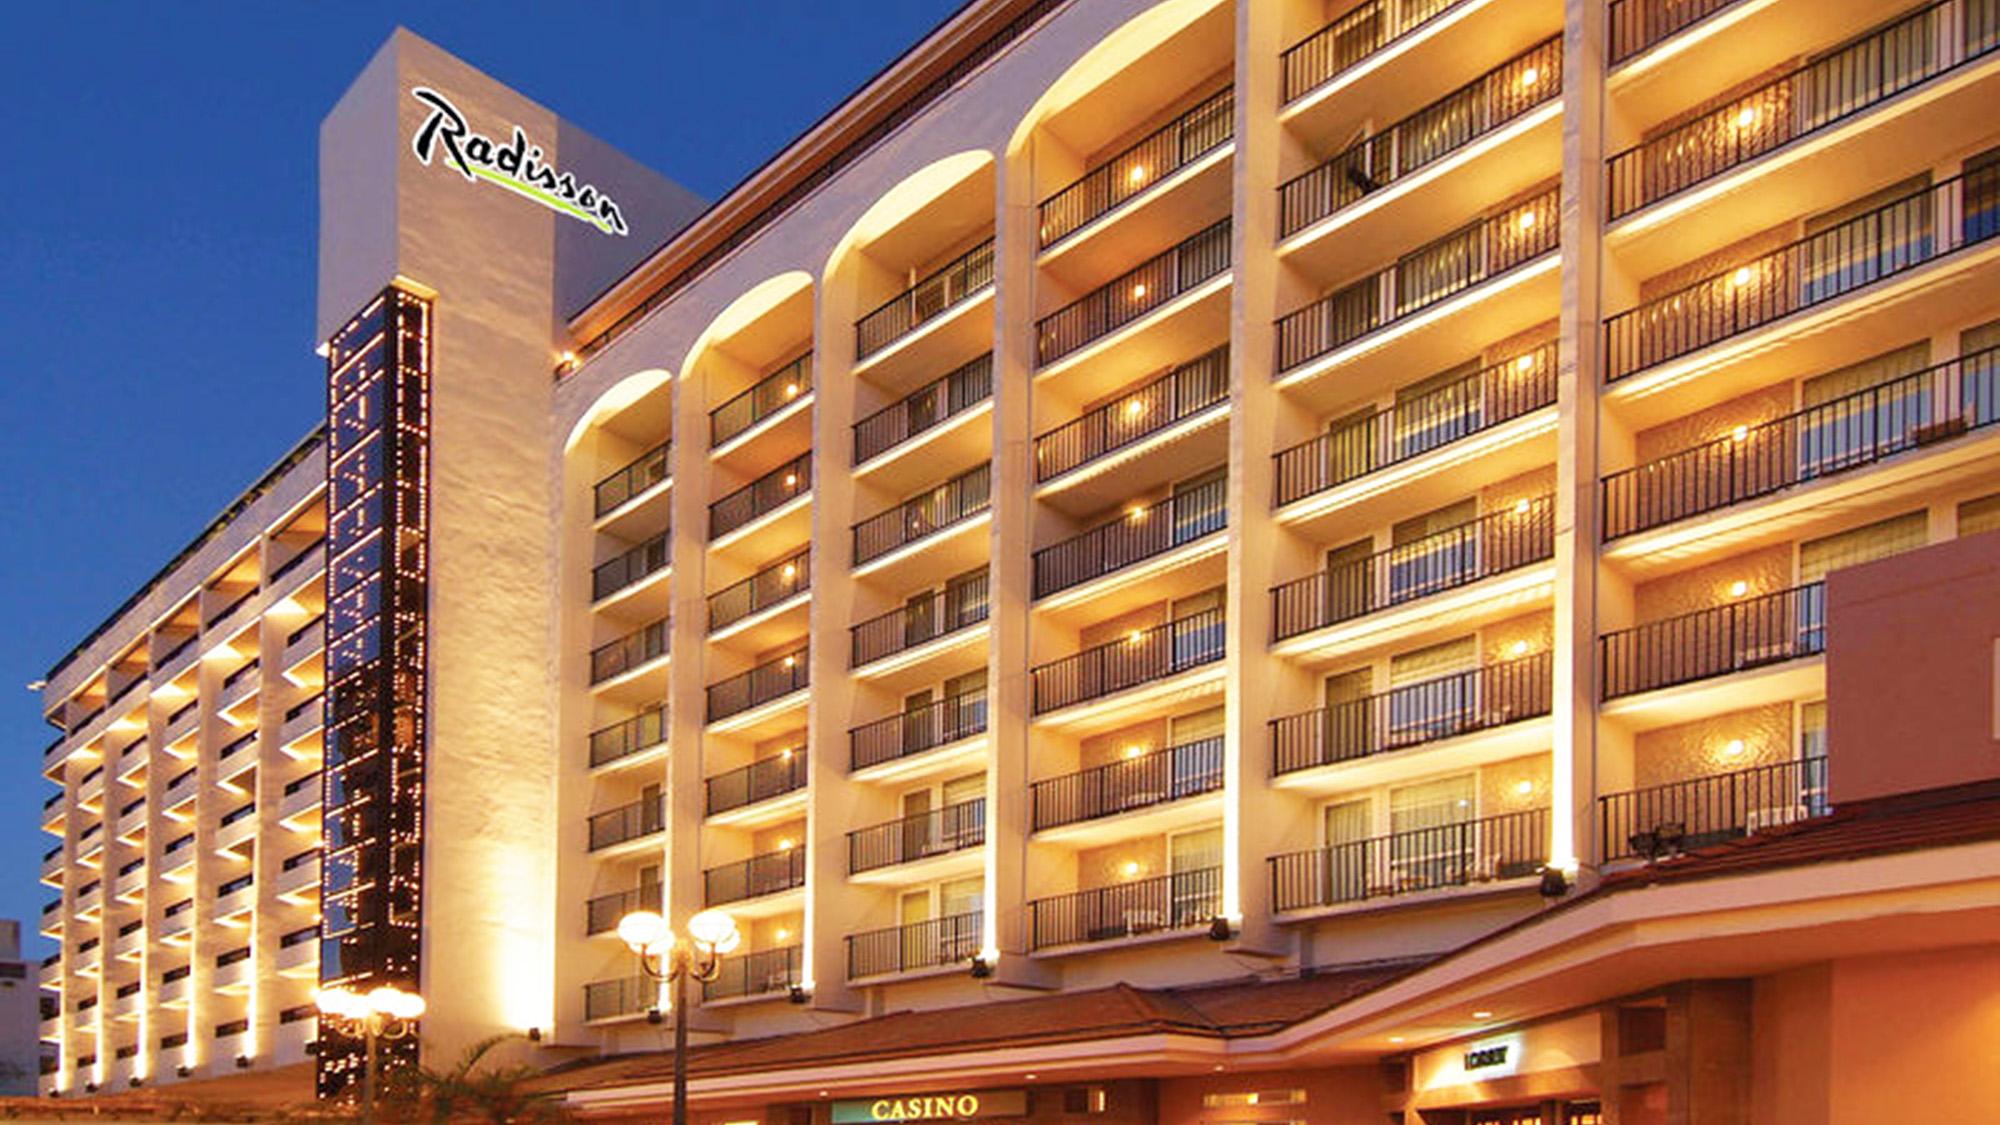 Radisson ambassador plaza hotel casino san juan india online gambling